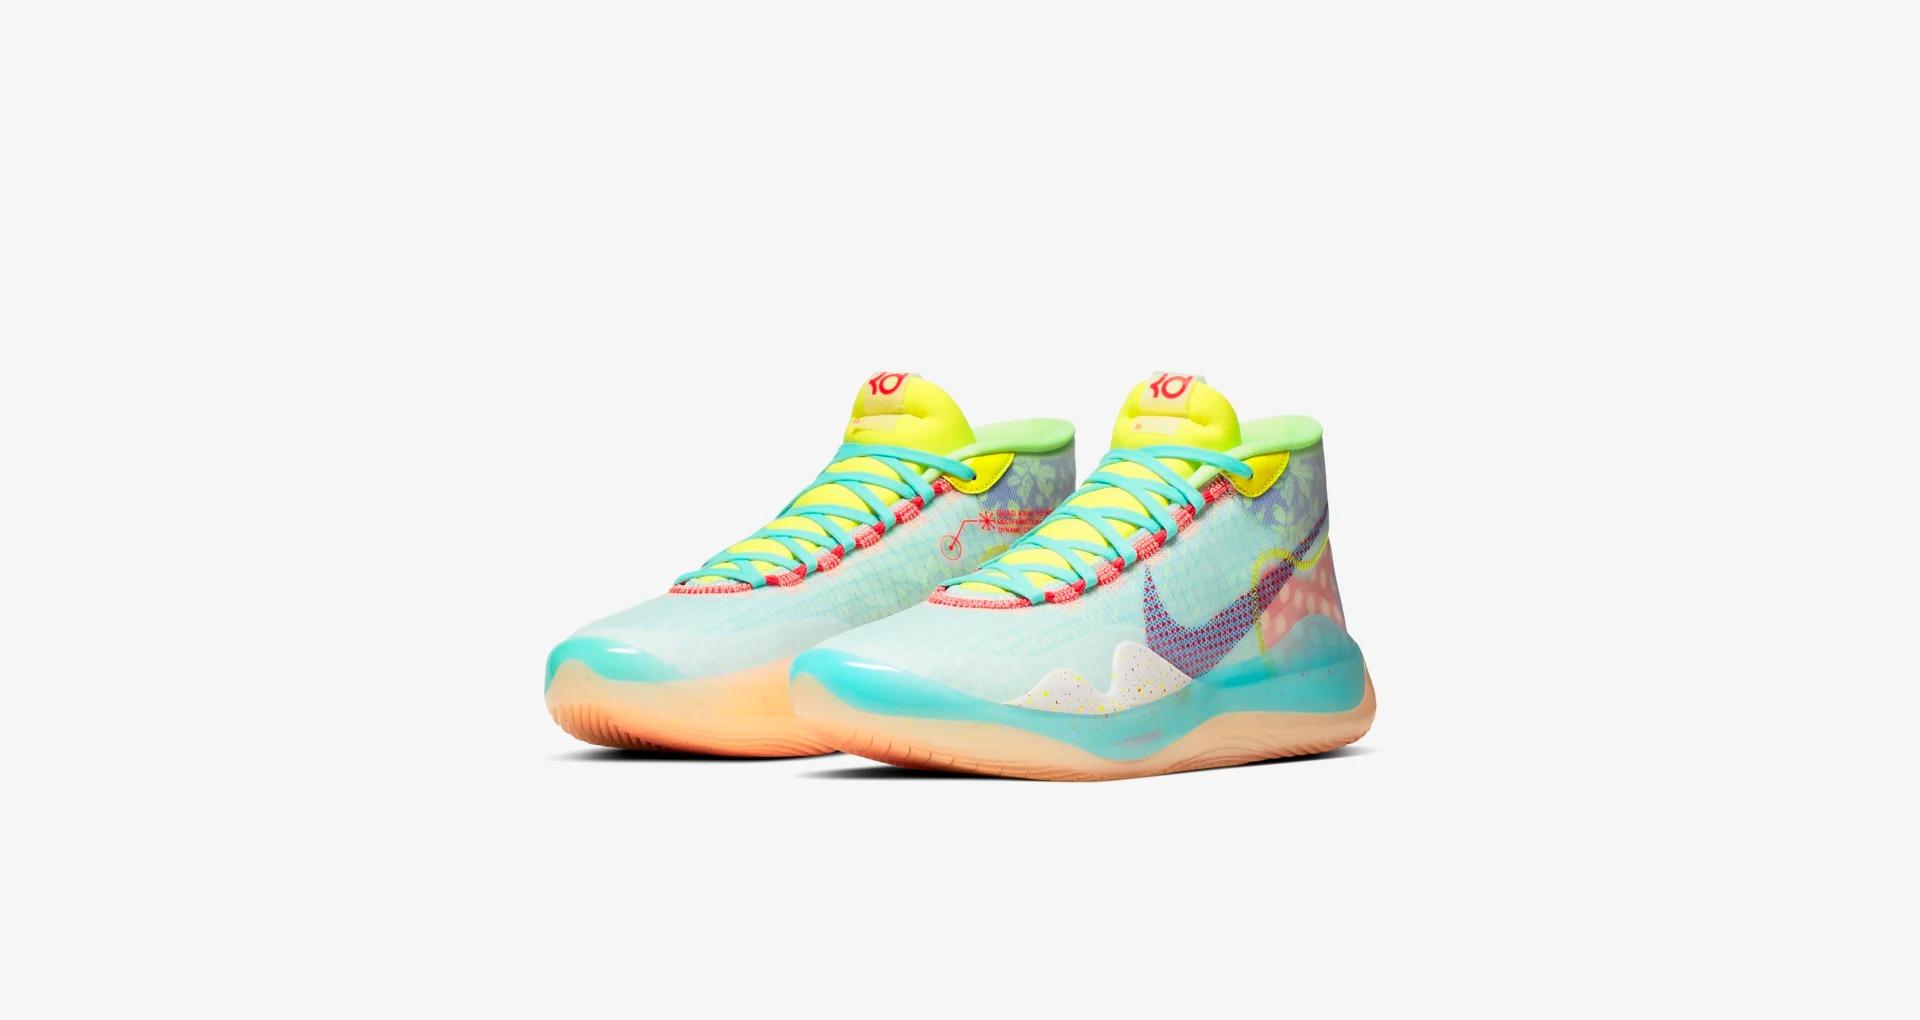 "Nike,KD12,Peach Jam,CK1197-300  清爽夏日的糖果色调!全新配色 KD12 ""Peach Jam"" 明日发售!"